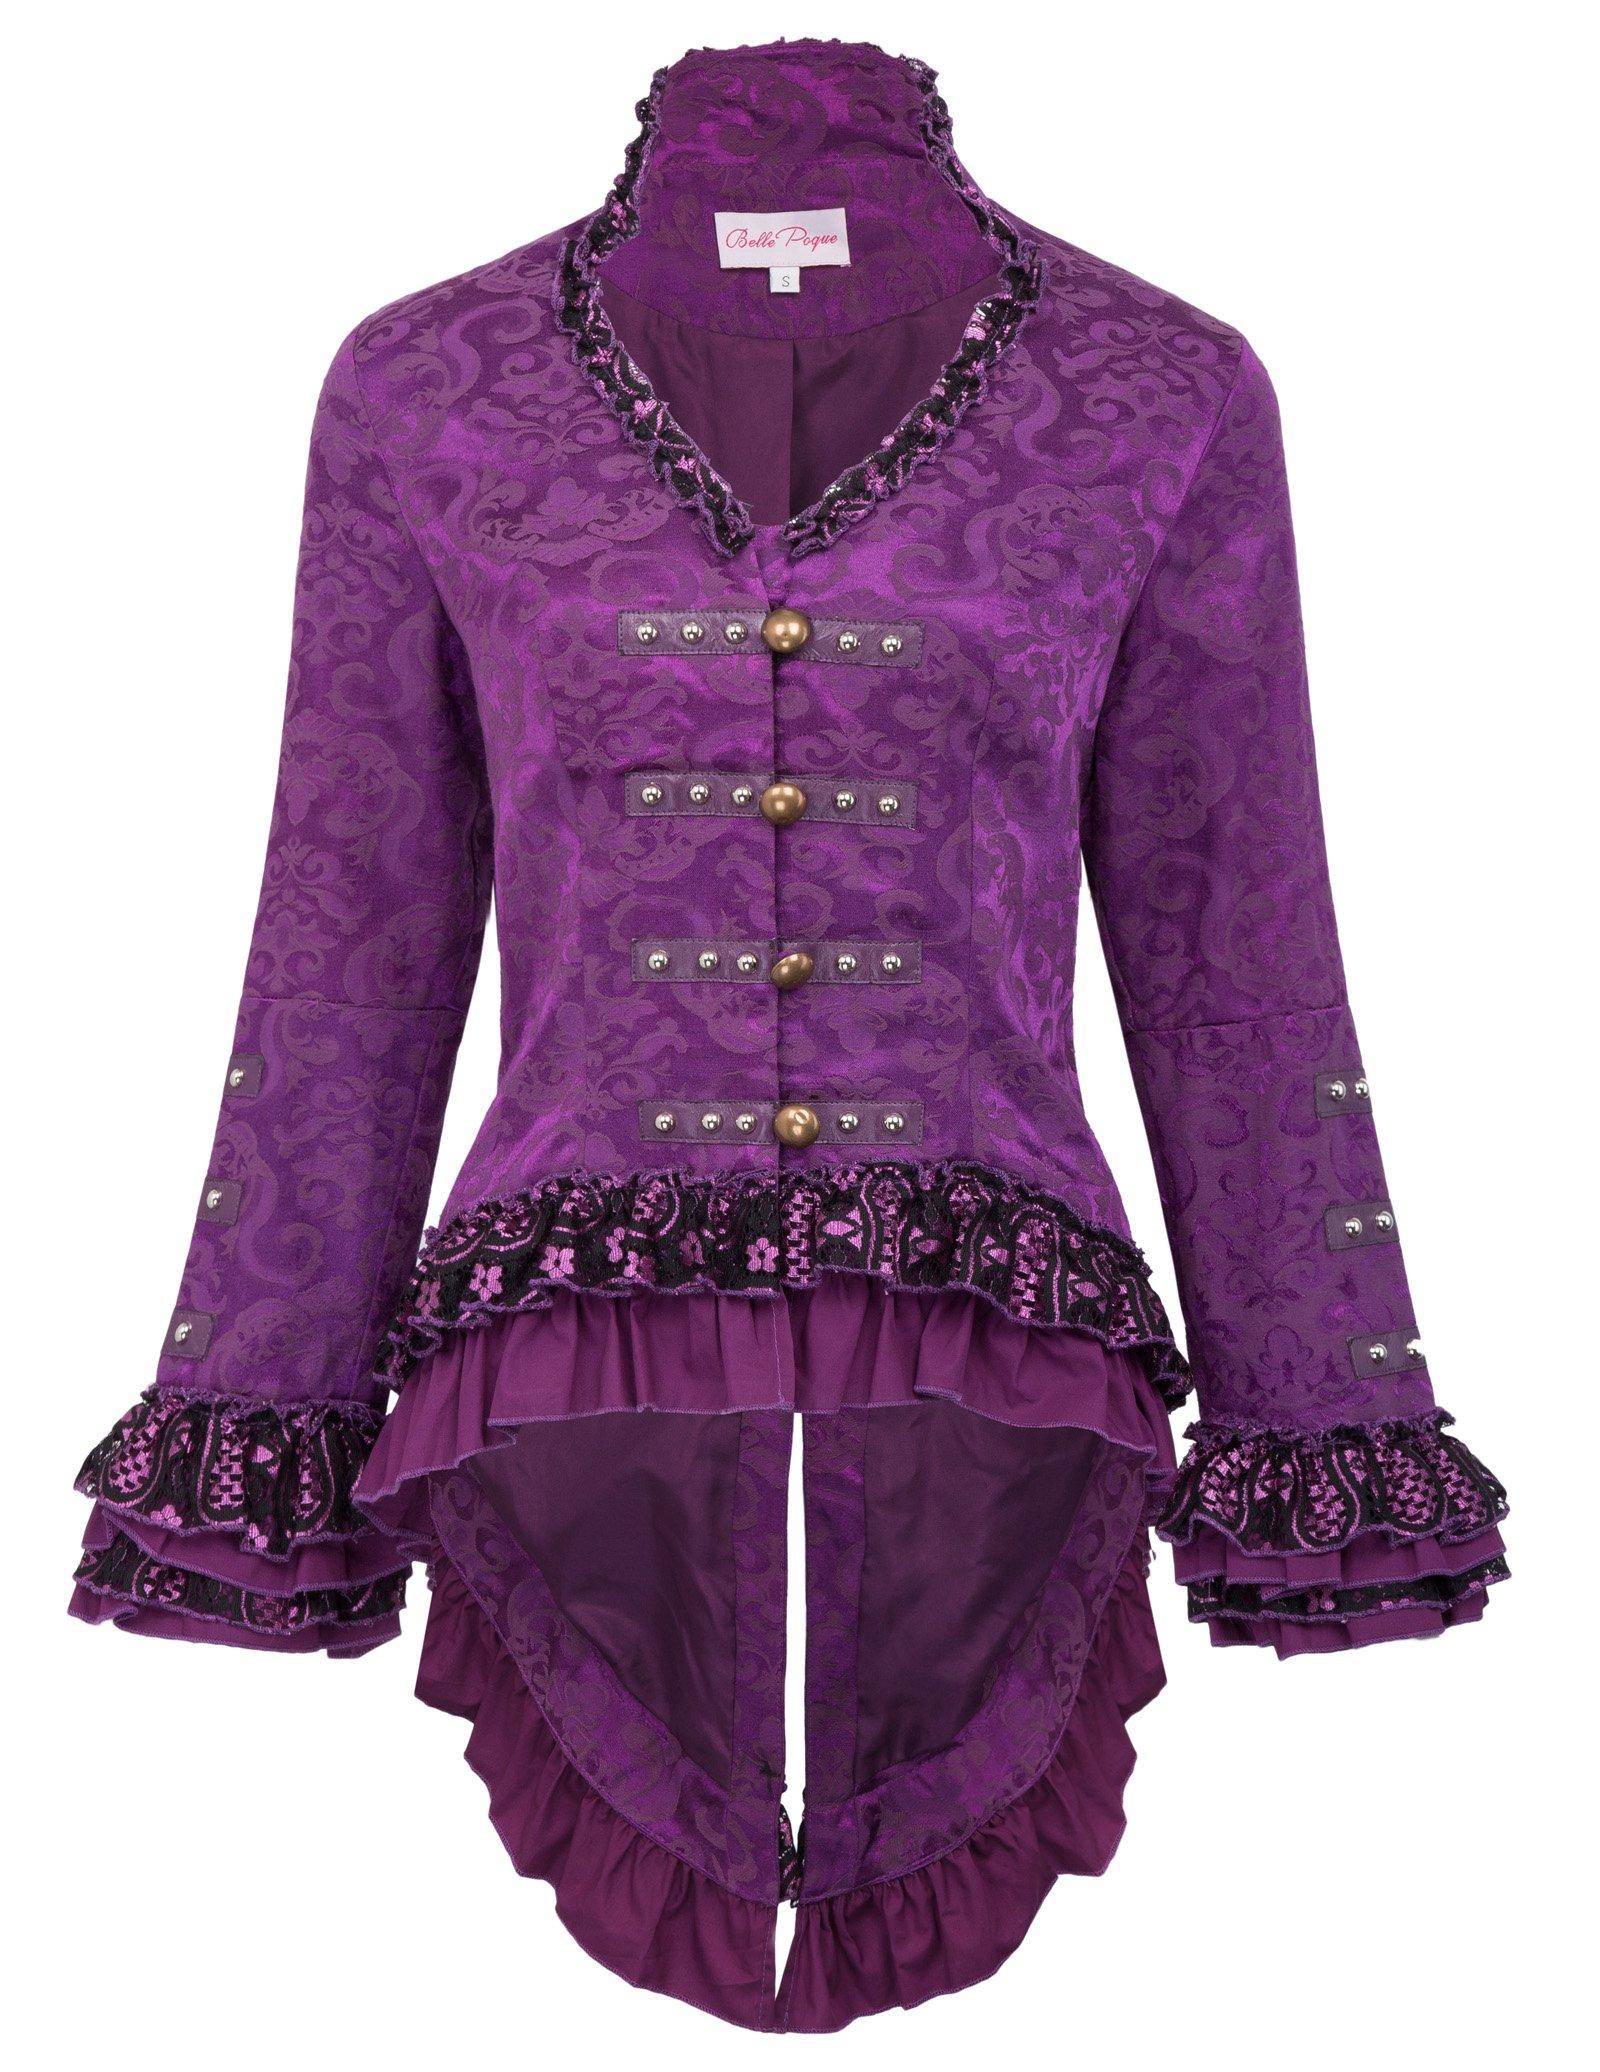 Women's Steampunk Victorian Jacquard Coat Tops Corset Tailcoat BP223-3 Purple Size M